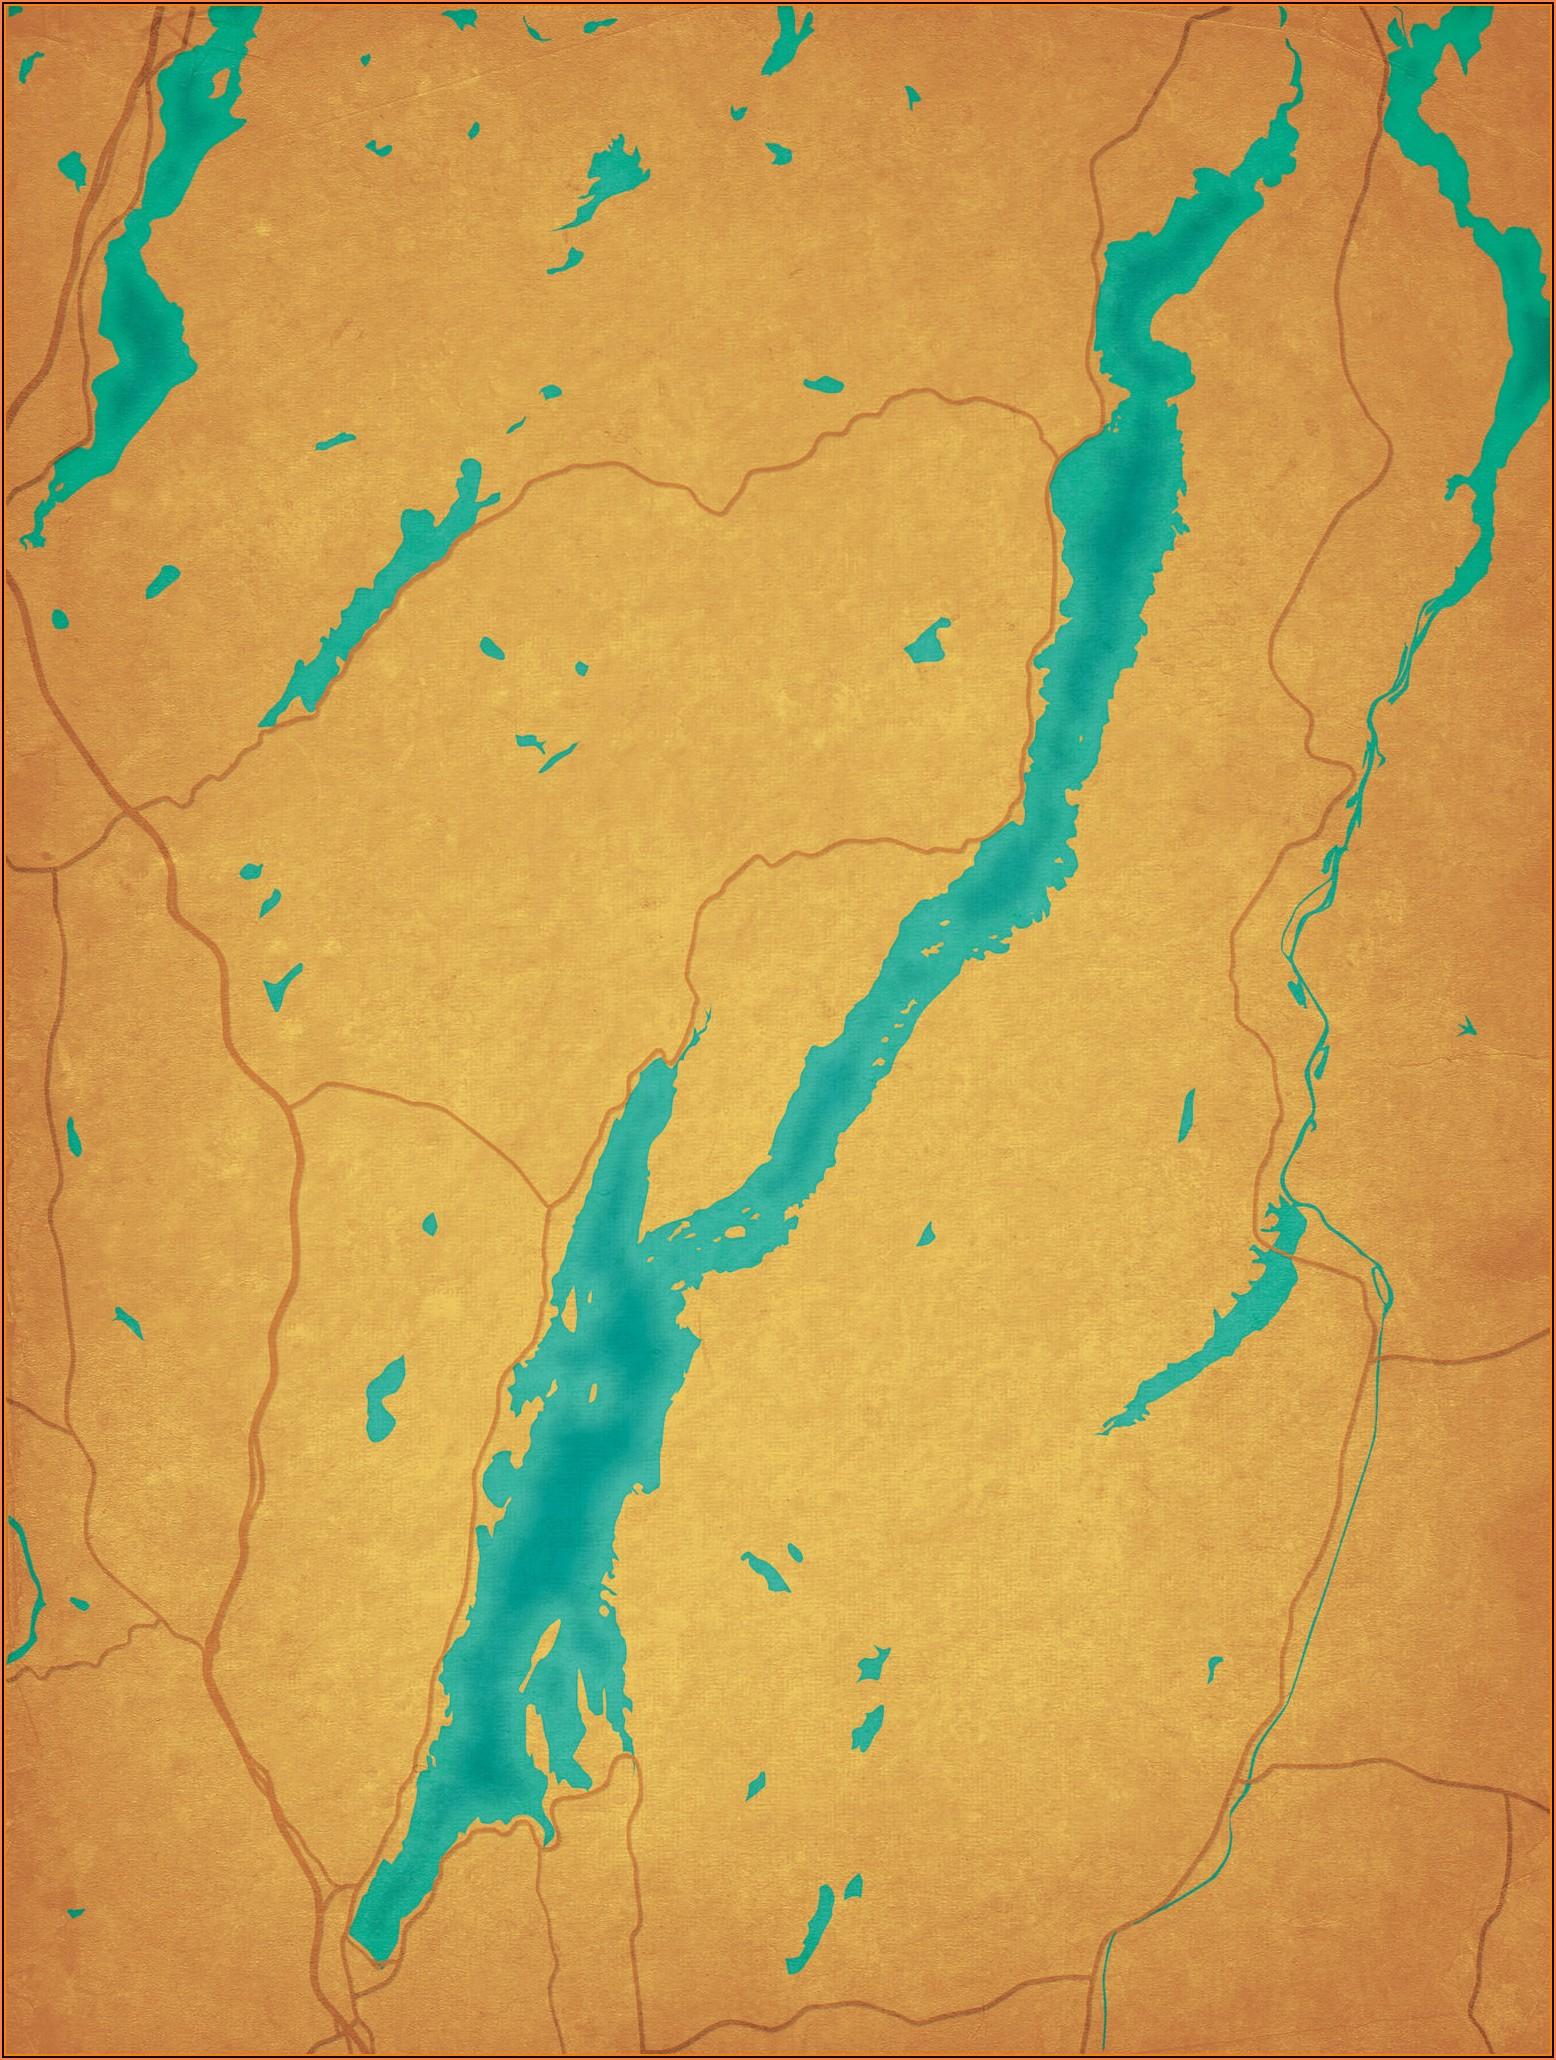 Lake George Indiana Topographic Map